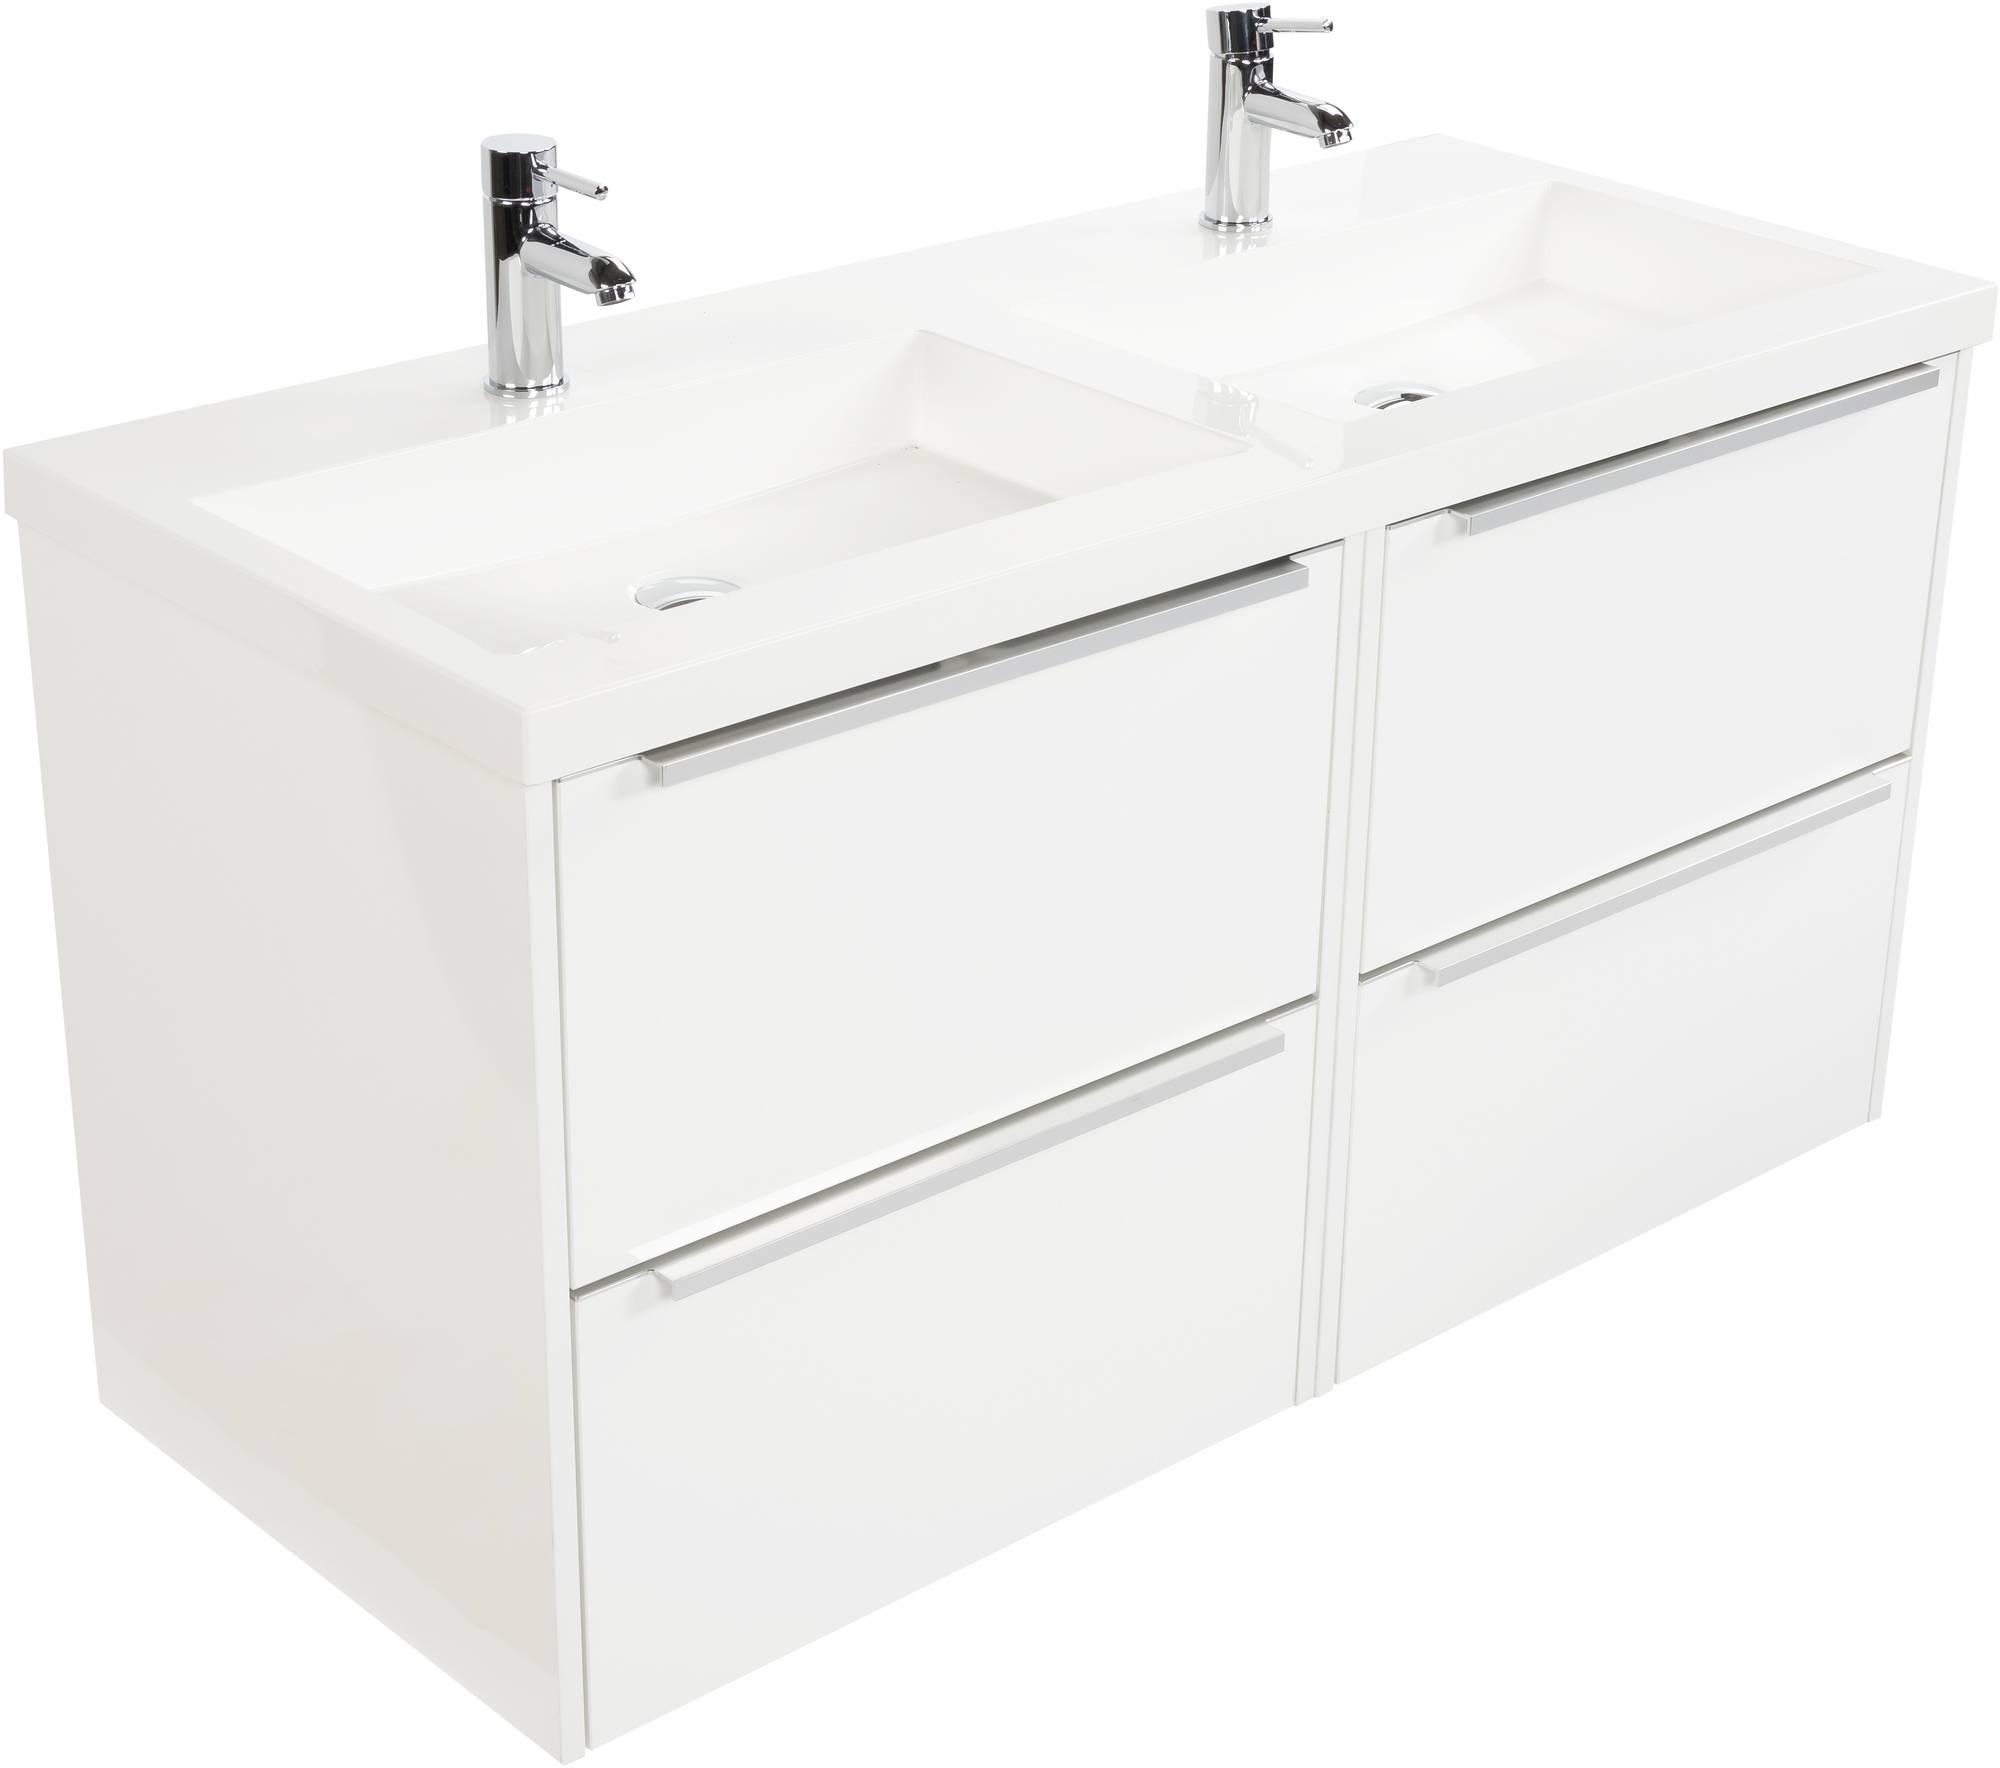 Saniselect Socan meubelset 4 lades met dubbele mineraalmarmere wastafel 120cm Glans Wit